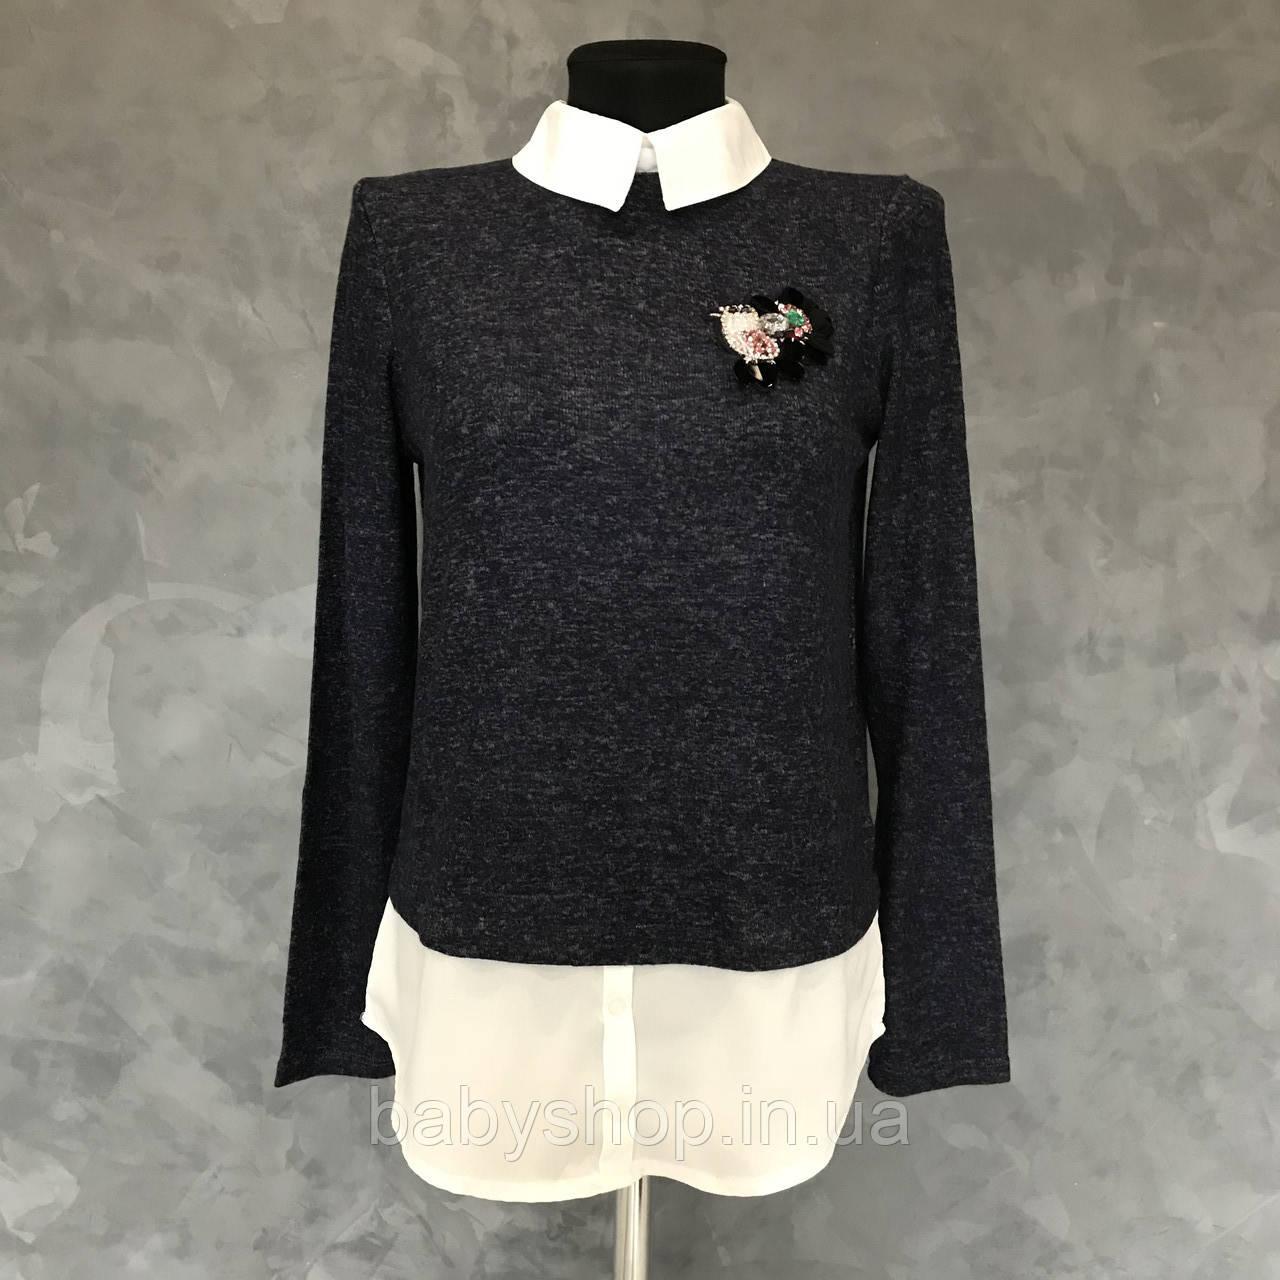 Женский свитер обманка.  Размер M